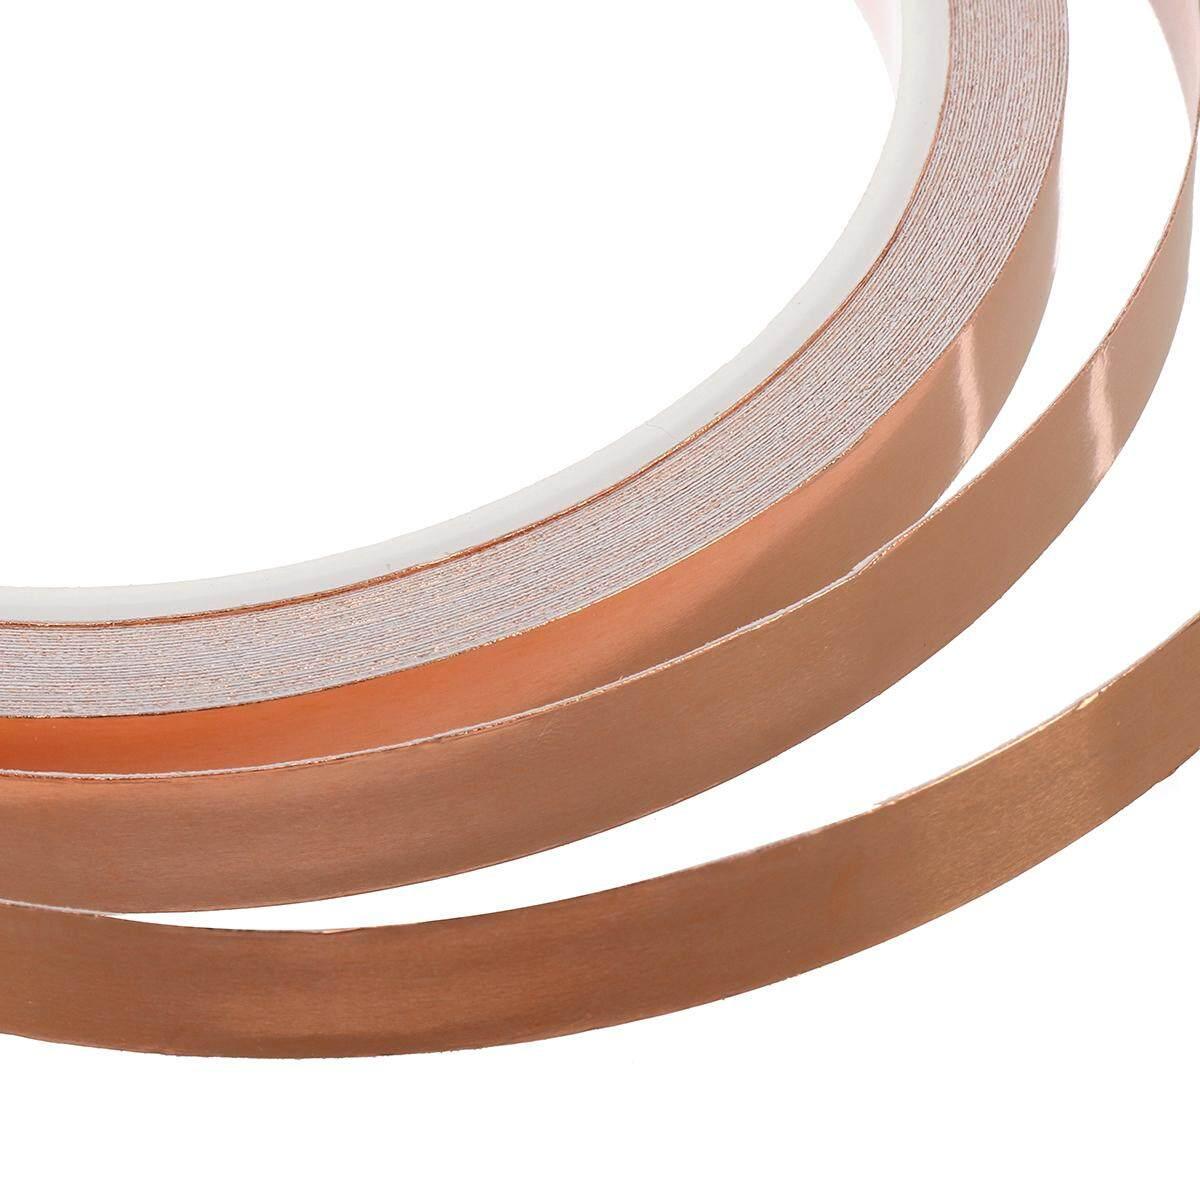 10m 6mm Single-sided Adhesive Conductive Copper Foil Tape Guitar Pickup EMI Shield